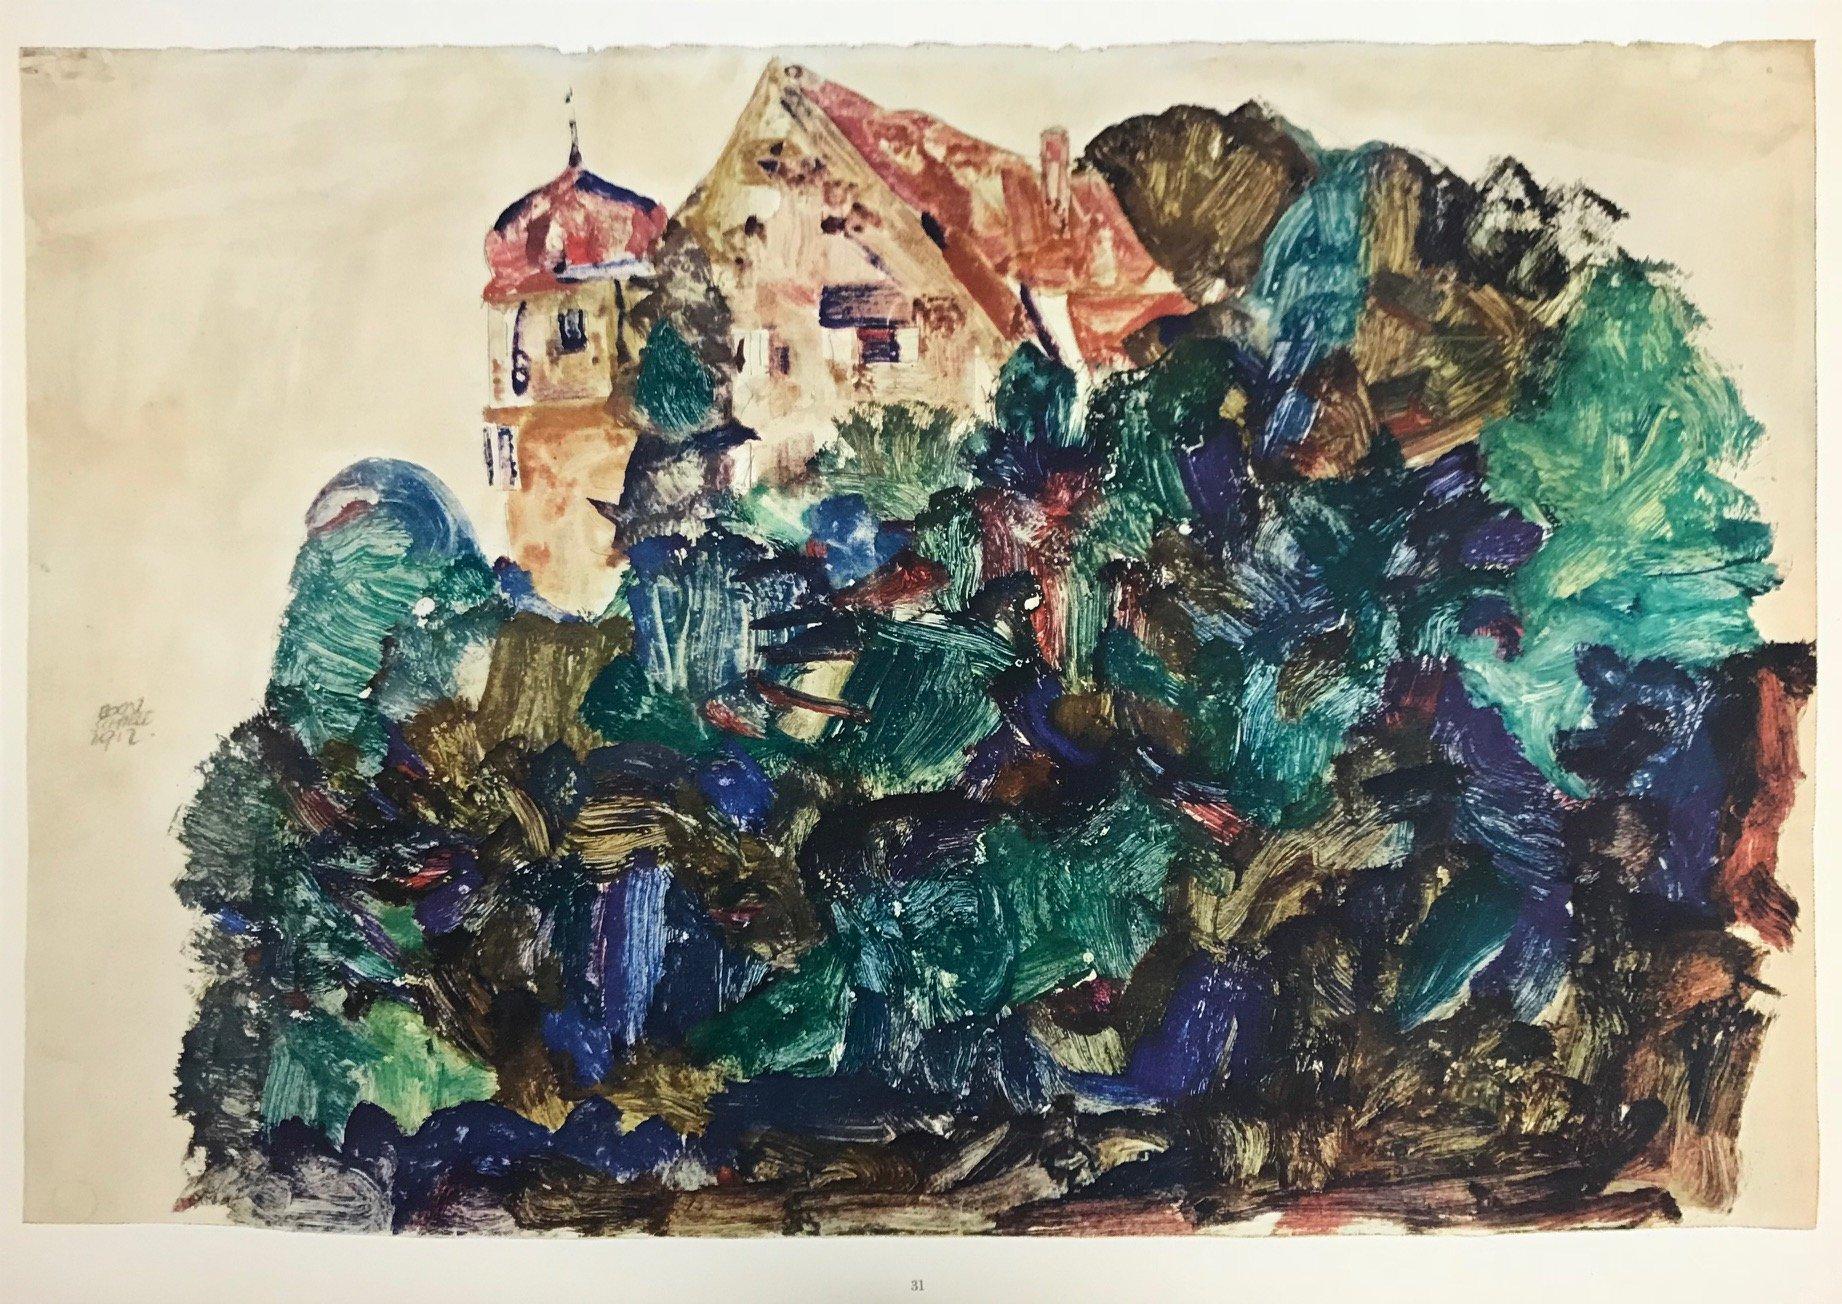 Schiele 31, Lithograph Old Castle in Bregenz, 1968